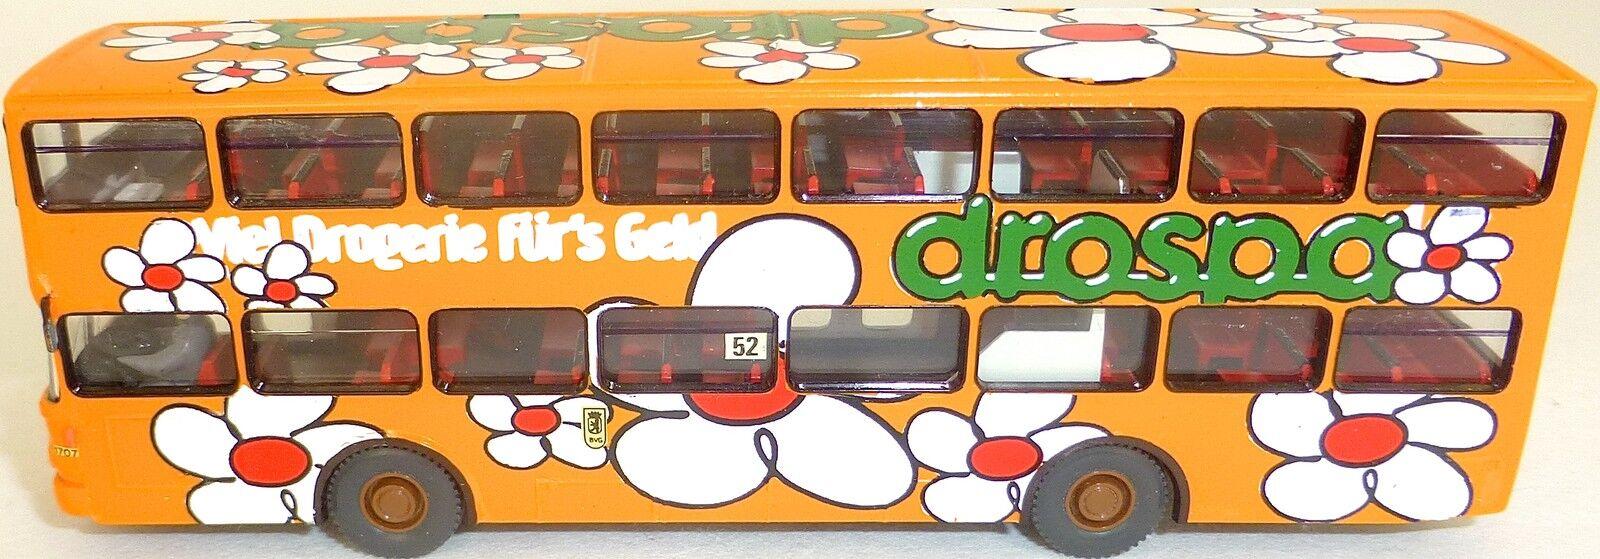 Drospa l í nea 52 sd 200 en hecho a mano de wiking - bus  87 h0 gd4 å